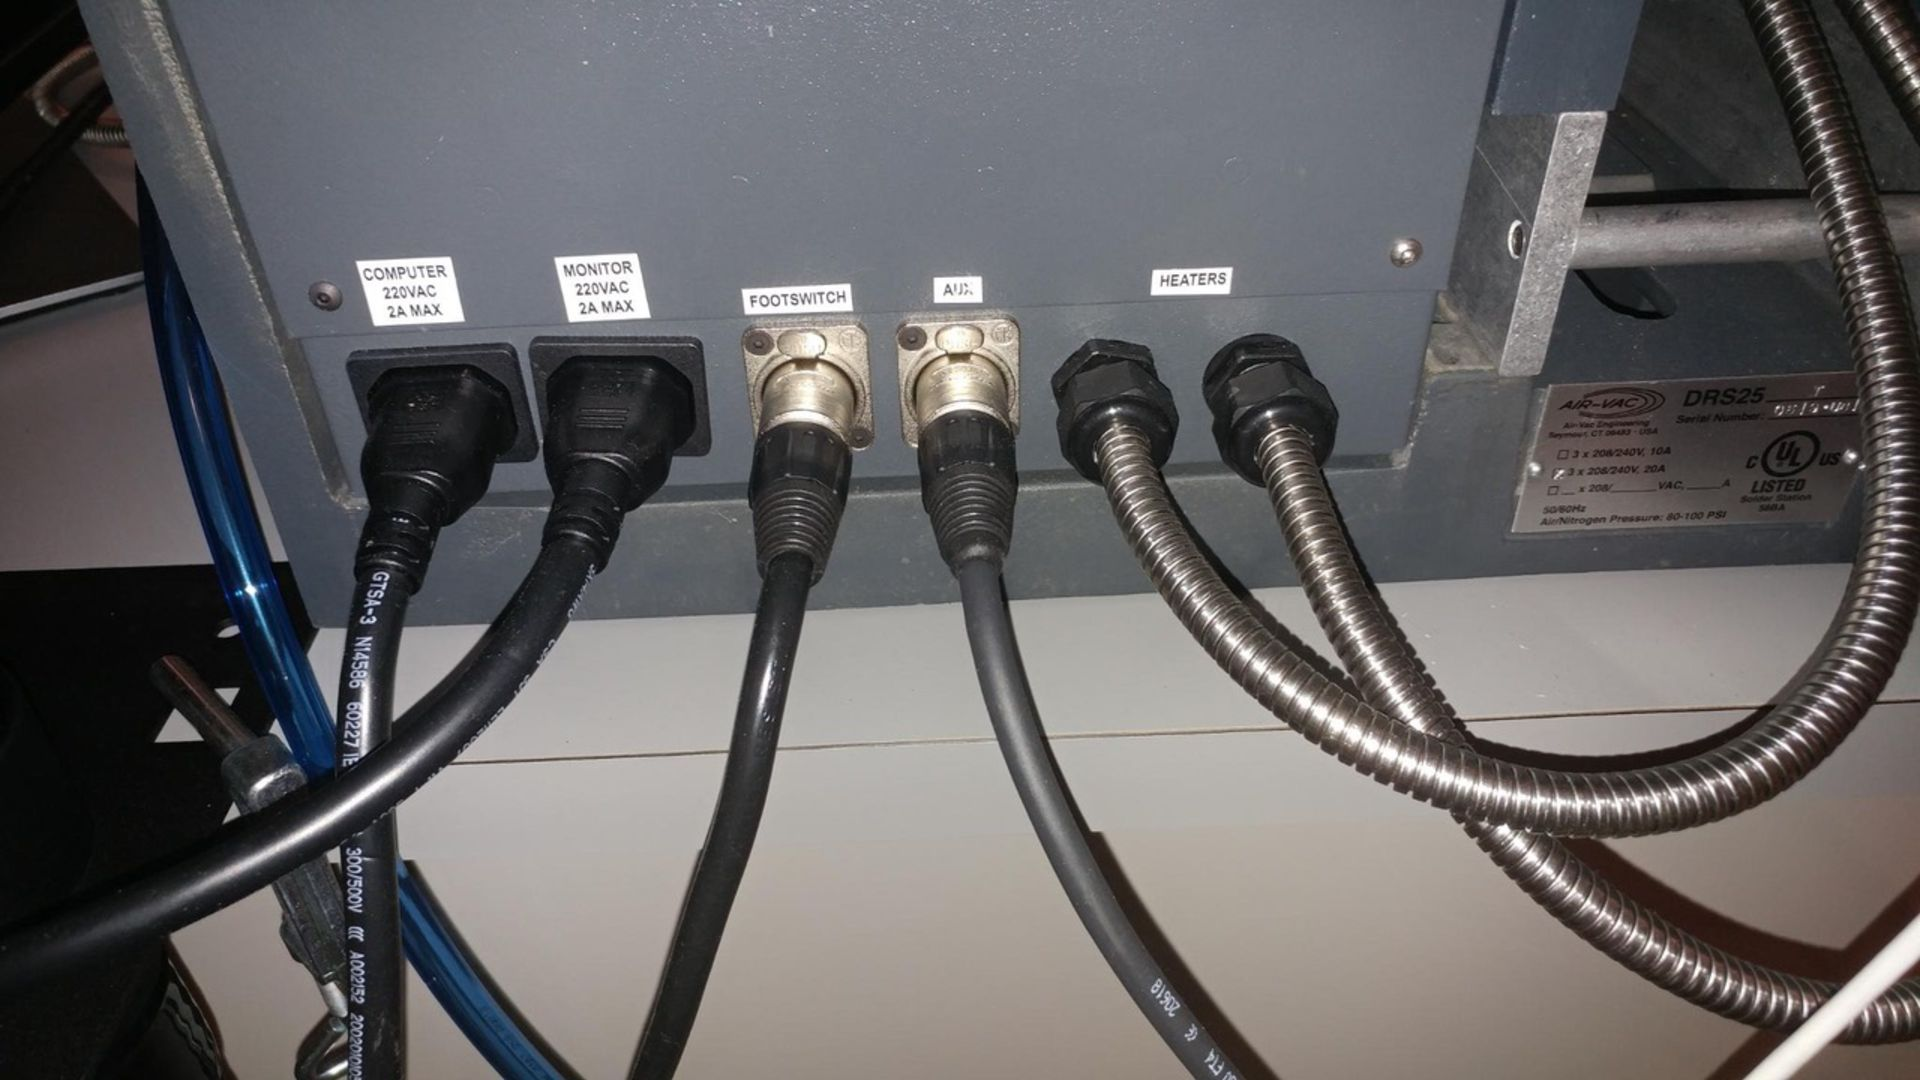 Air-Vac Rework Station, Model# DRS25, Serial# 0519-U6175, 208/240V, 3 Phase, 20 Amps, 50/60 Hz, - Image 10 of 14